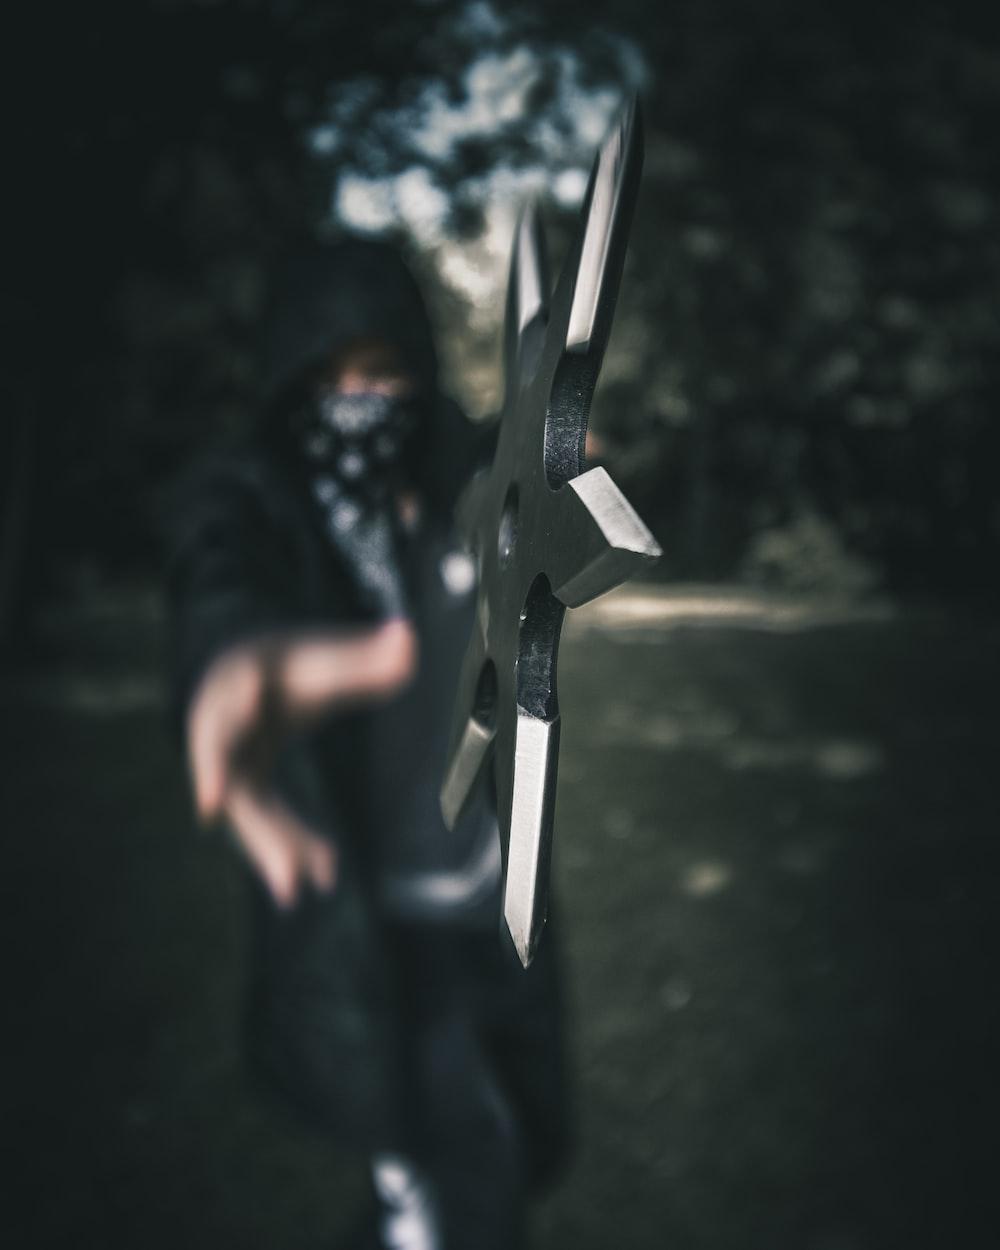 500 Ninja Pictures Hd Download Free Images On Unsplash